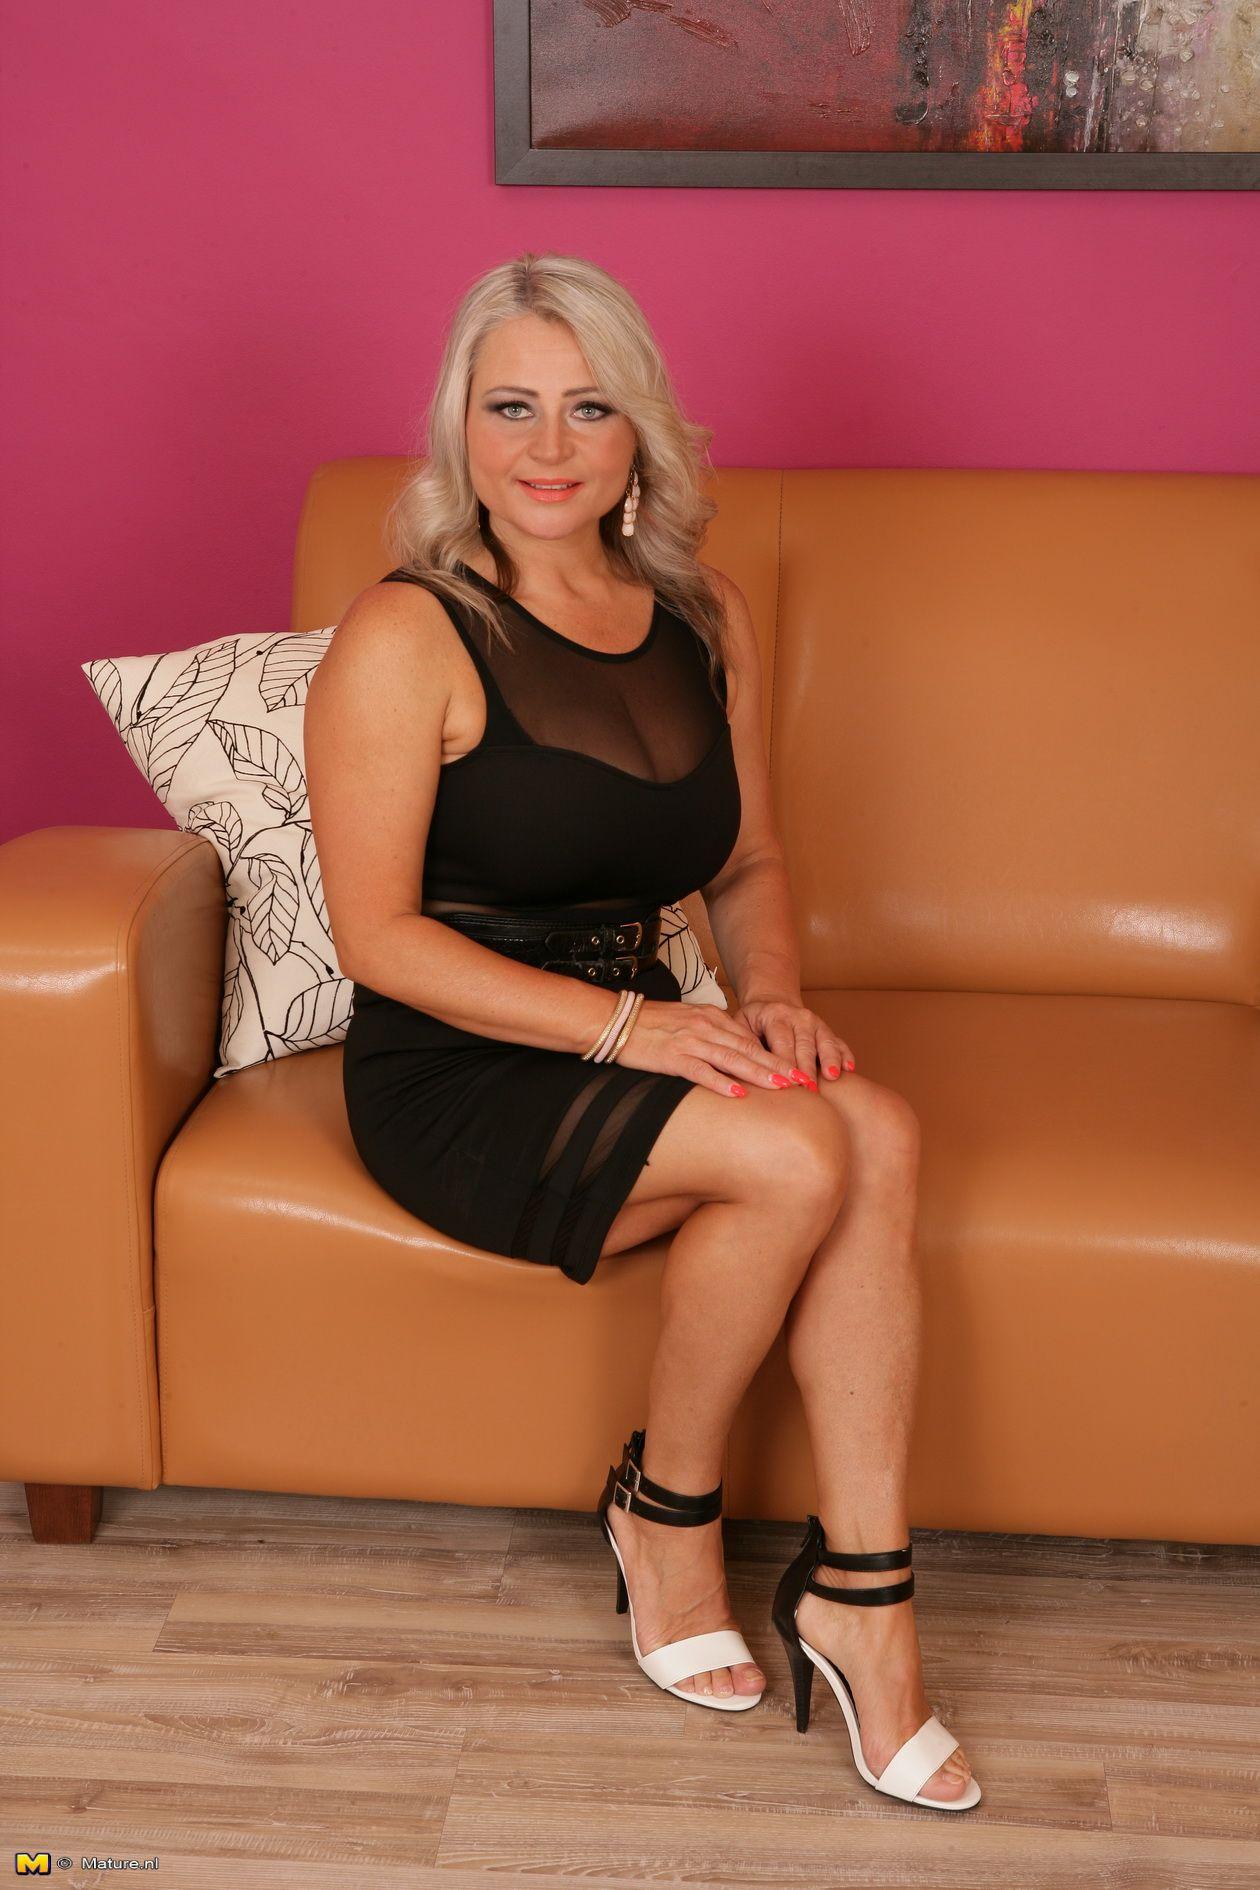 Good hot amature blonde milf